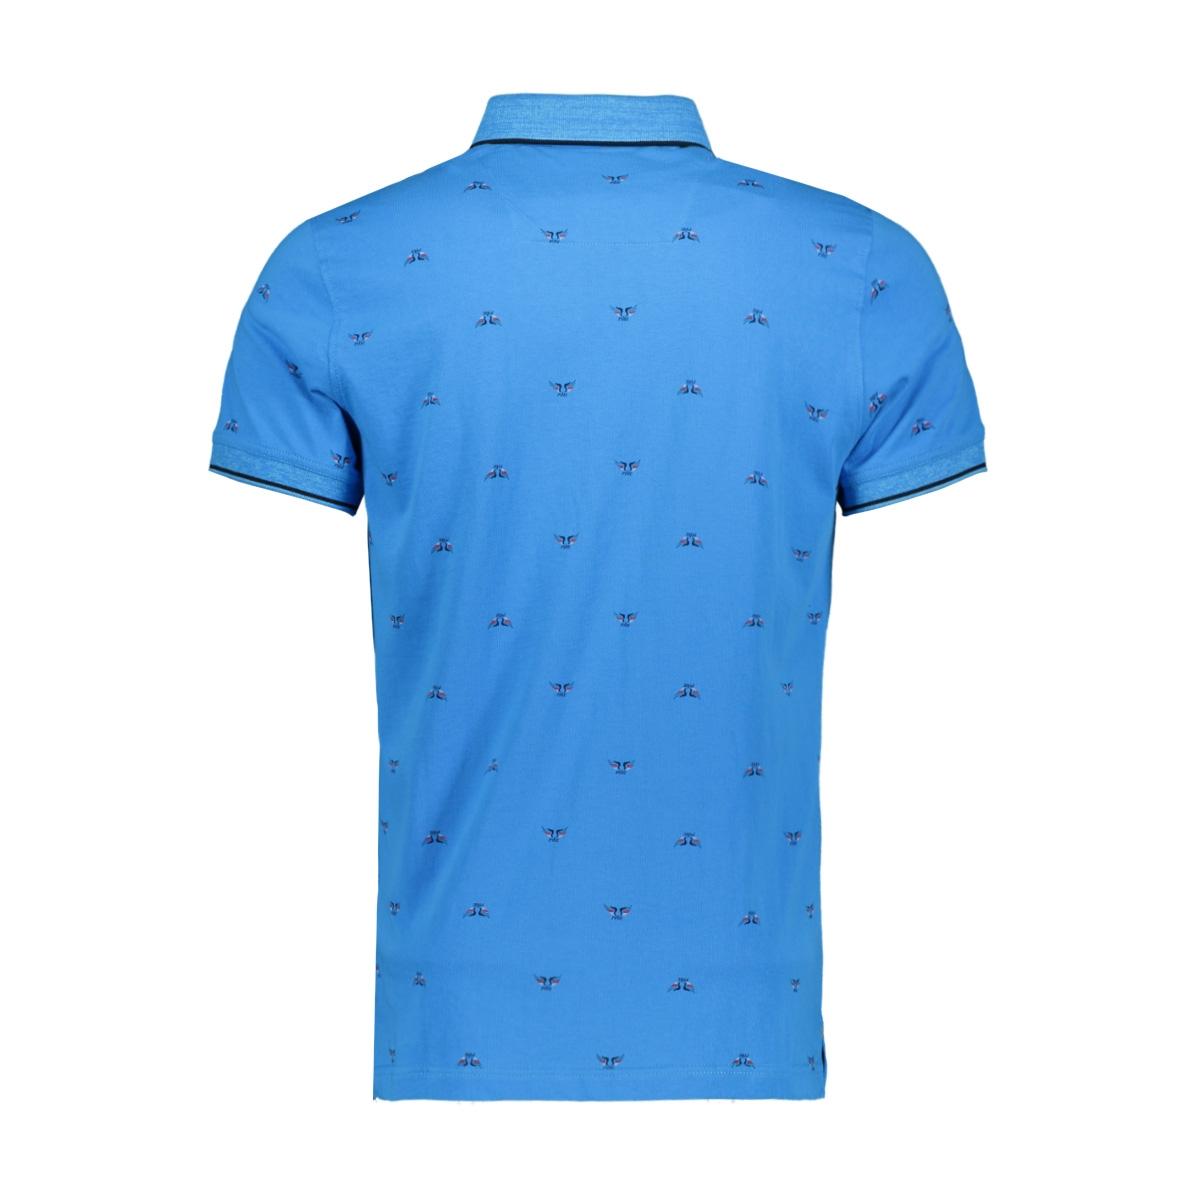 short sleeve polo ppss201854 pme legend polo 5177